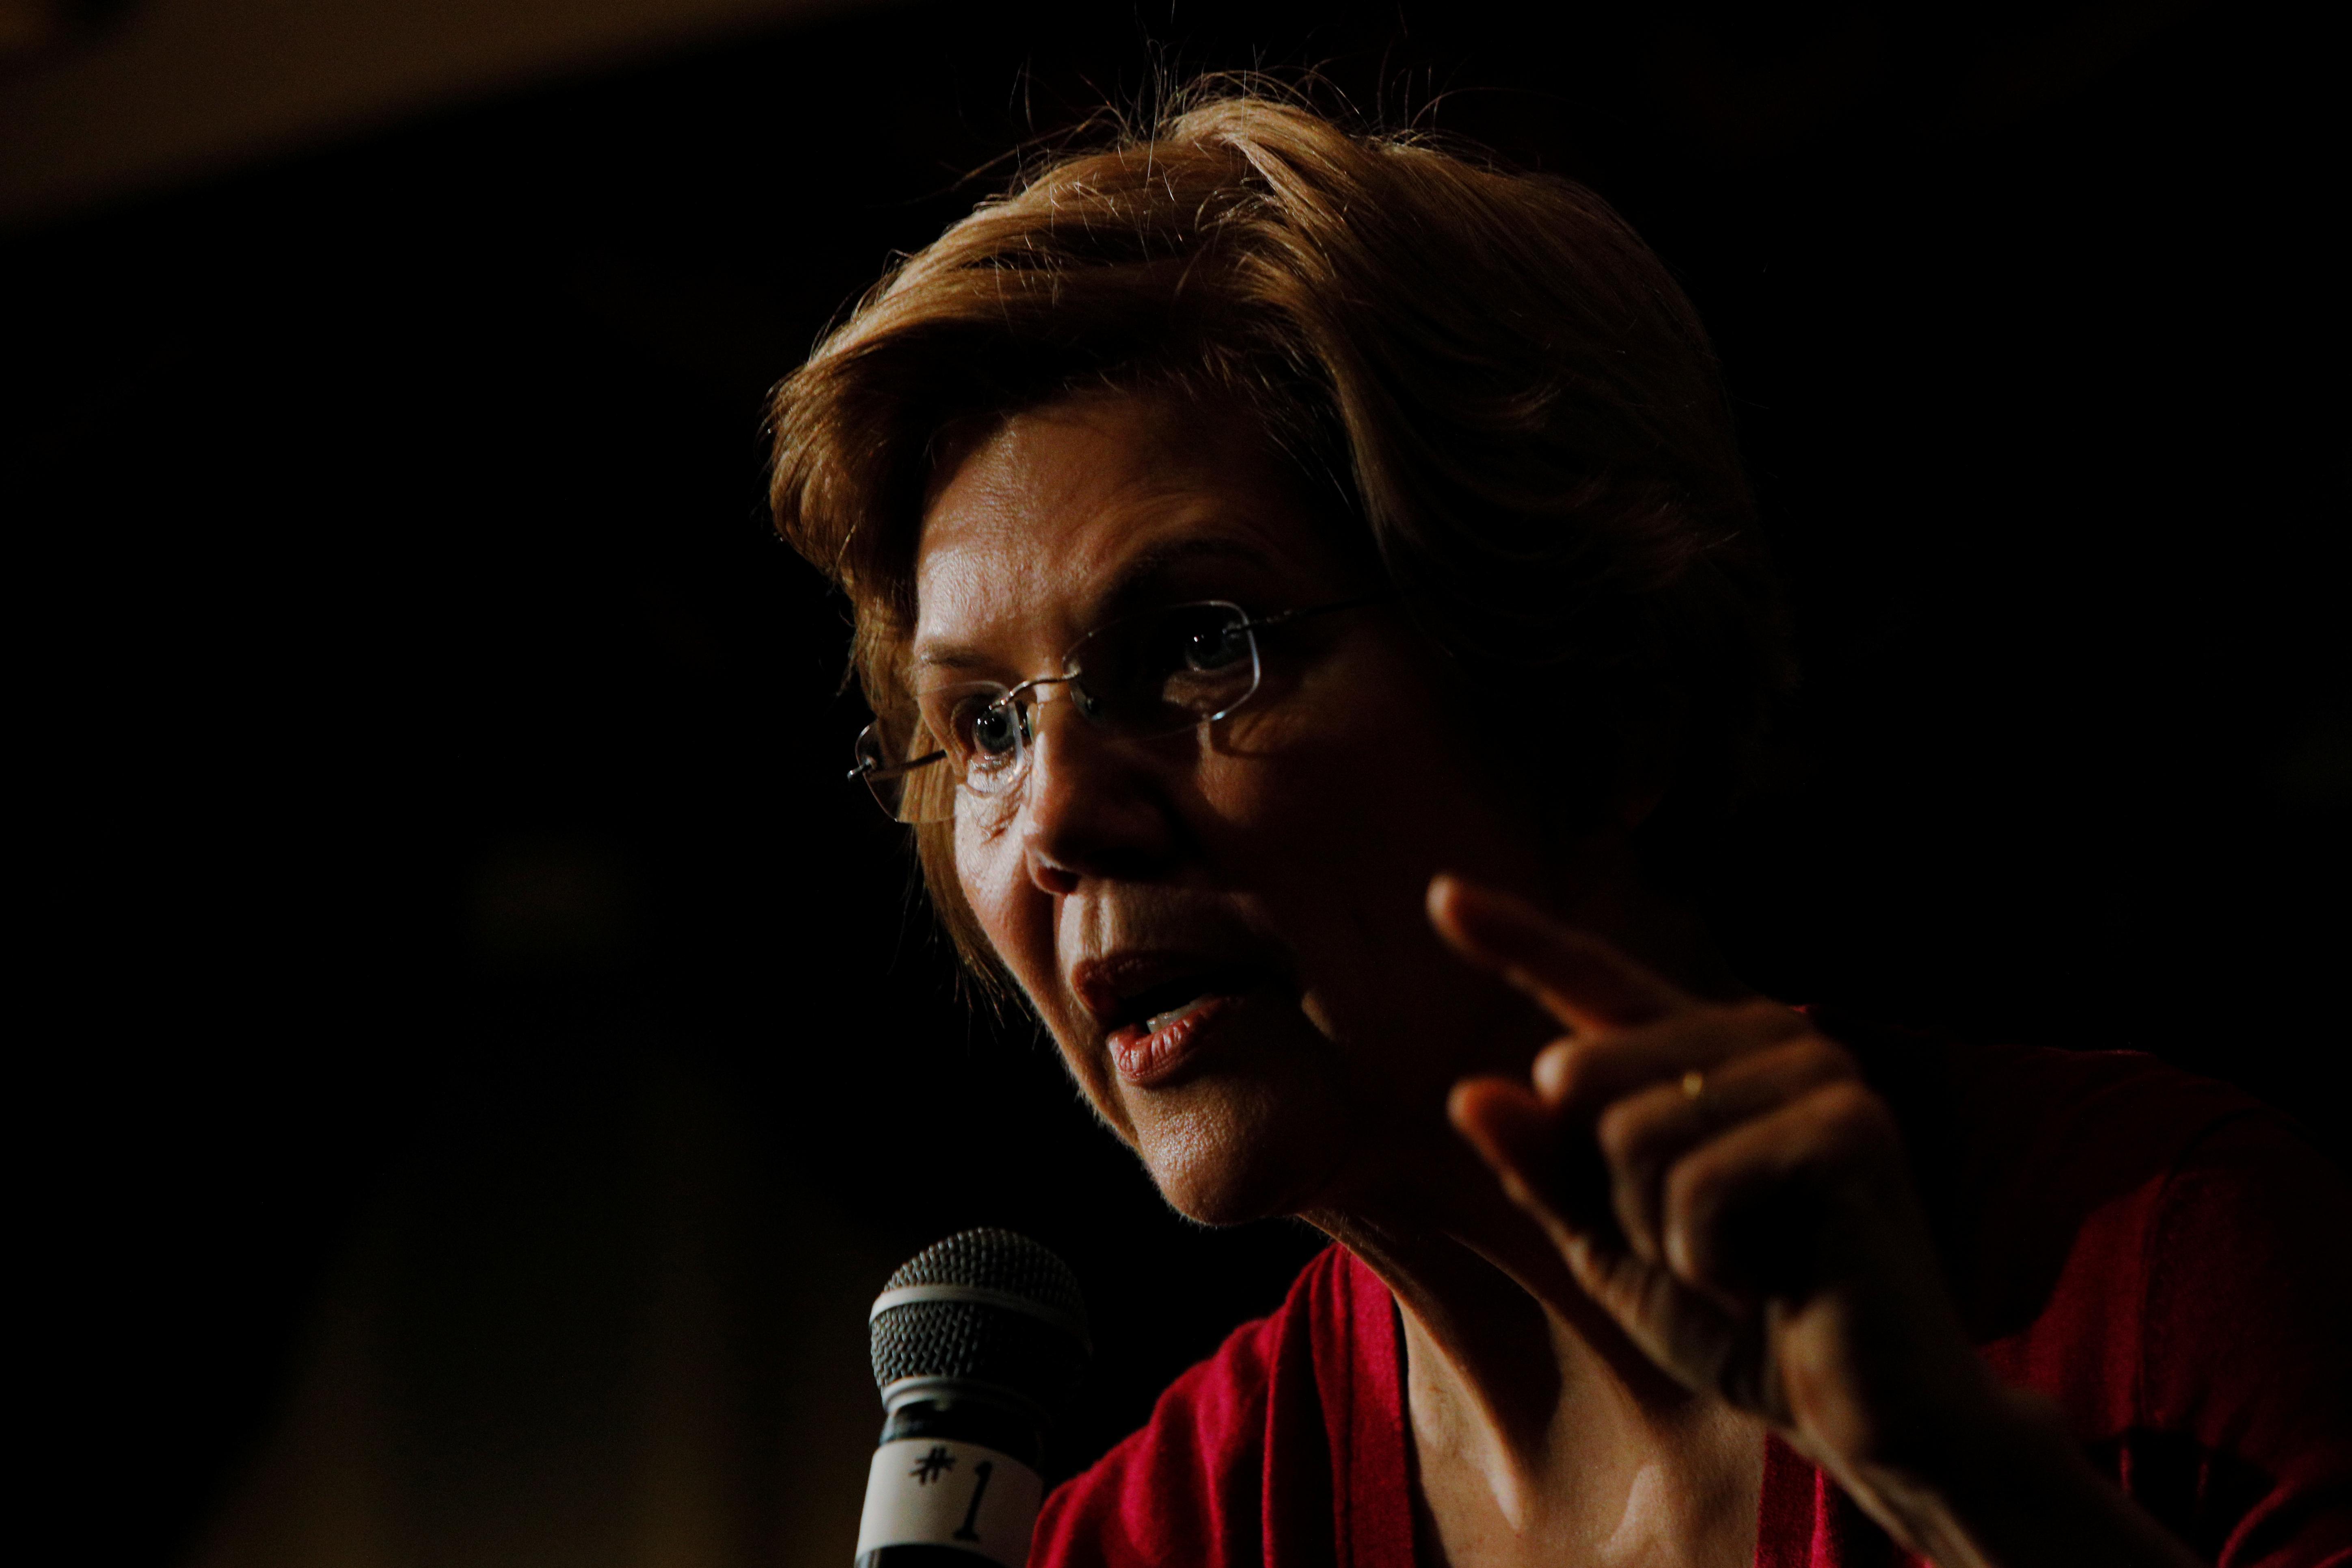 Democrat Warren takes economic message to Iowa in kickoff to 2020 race 2